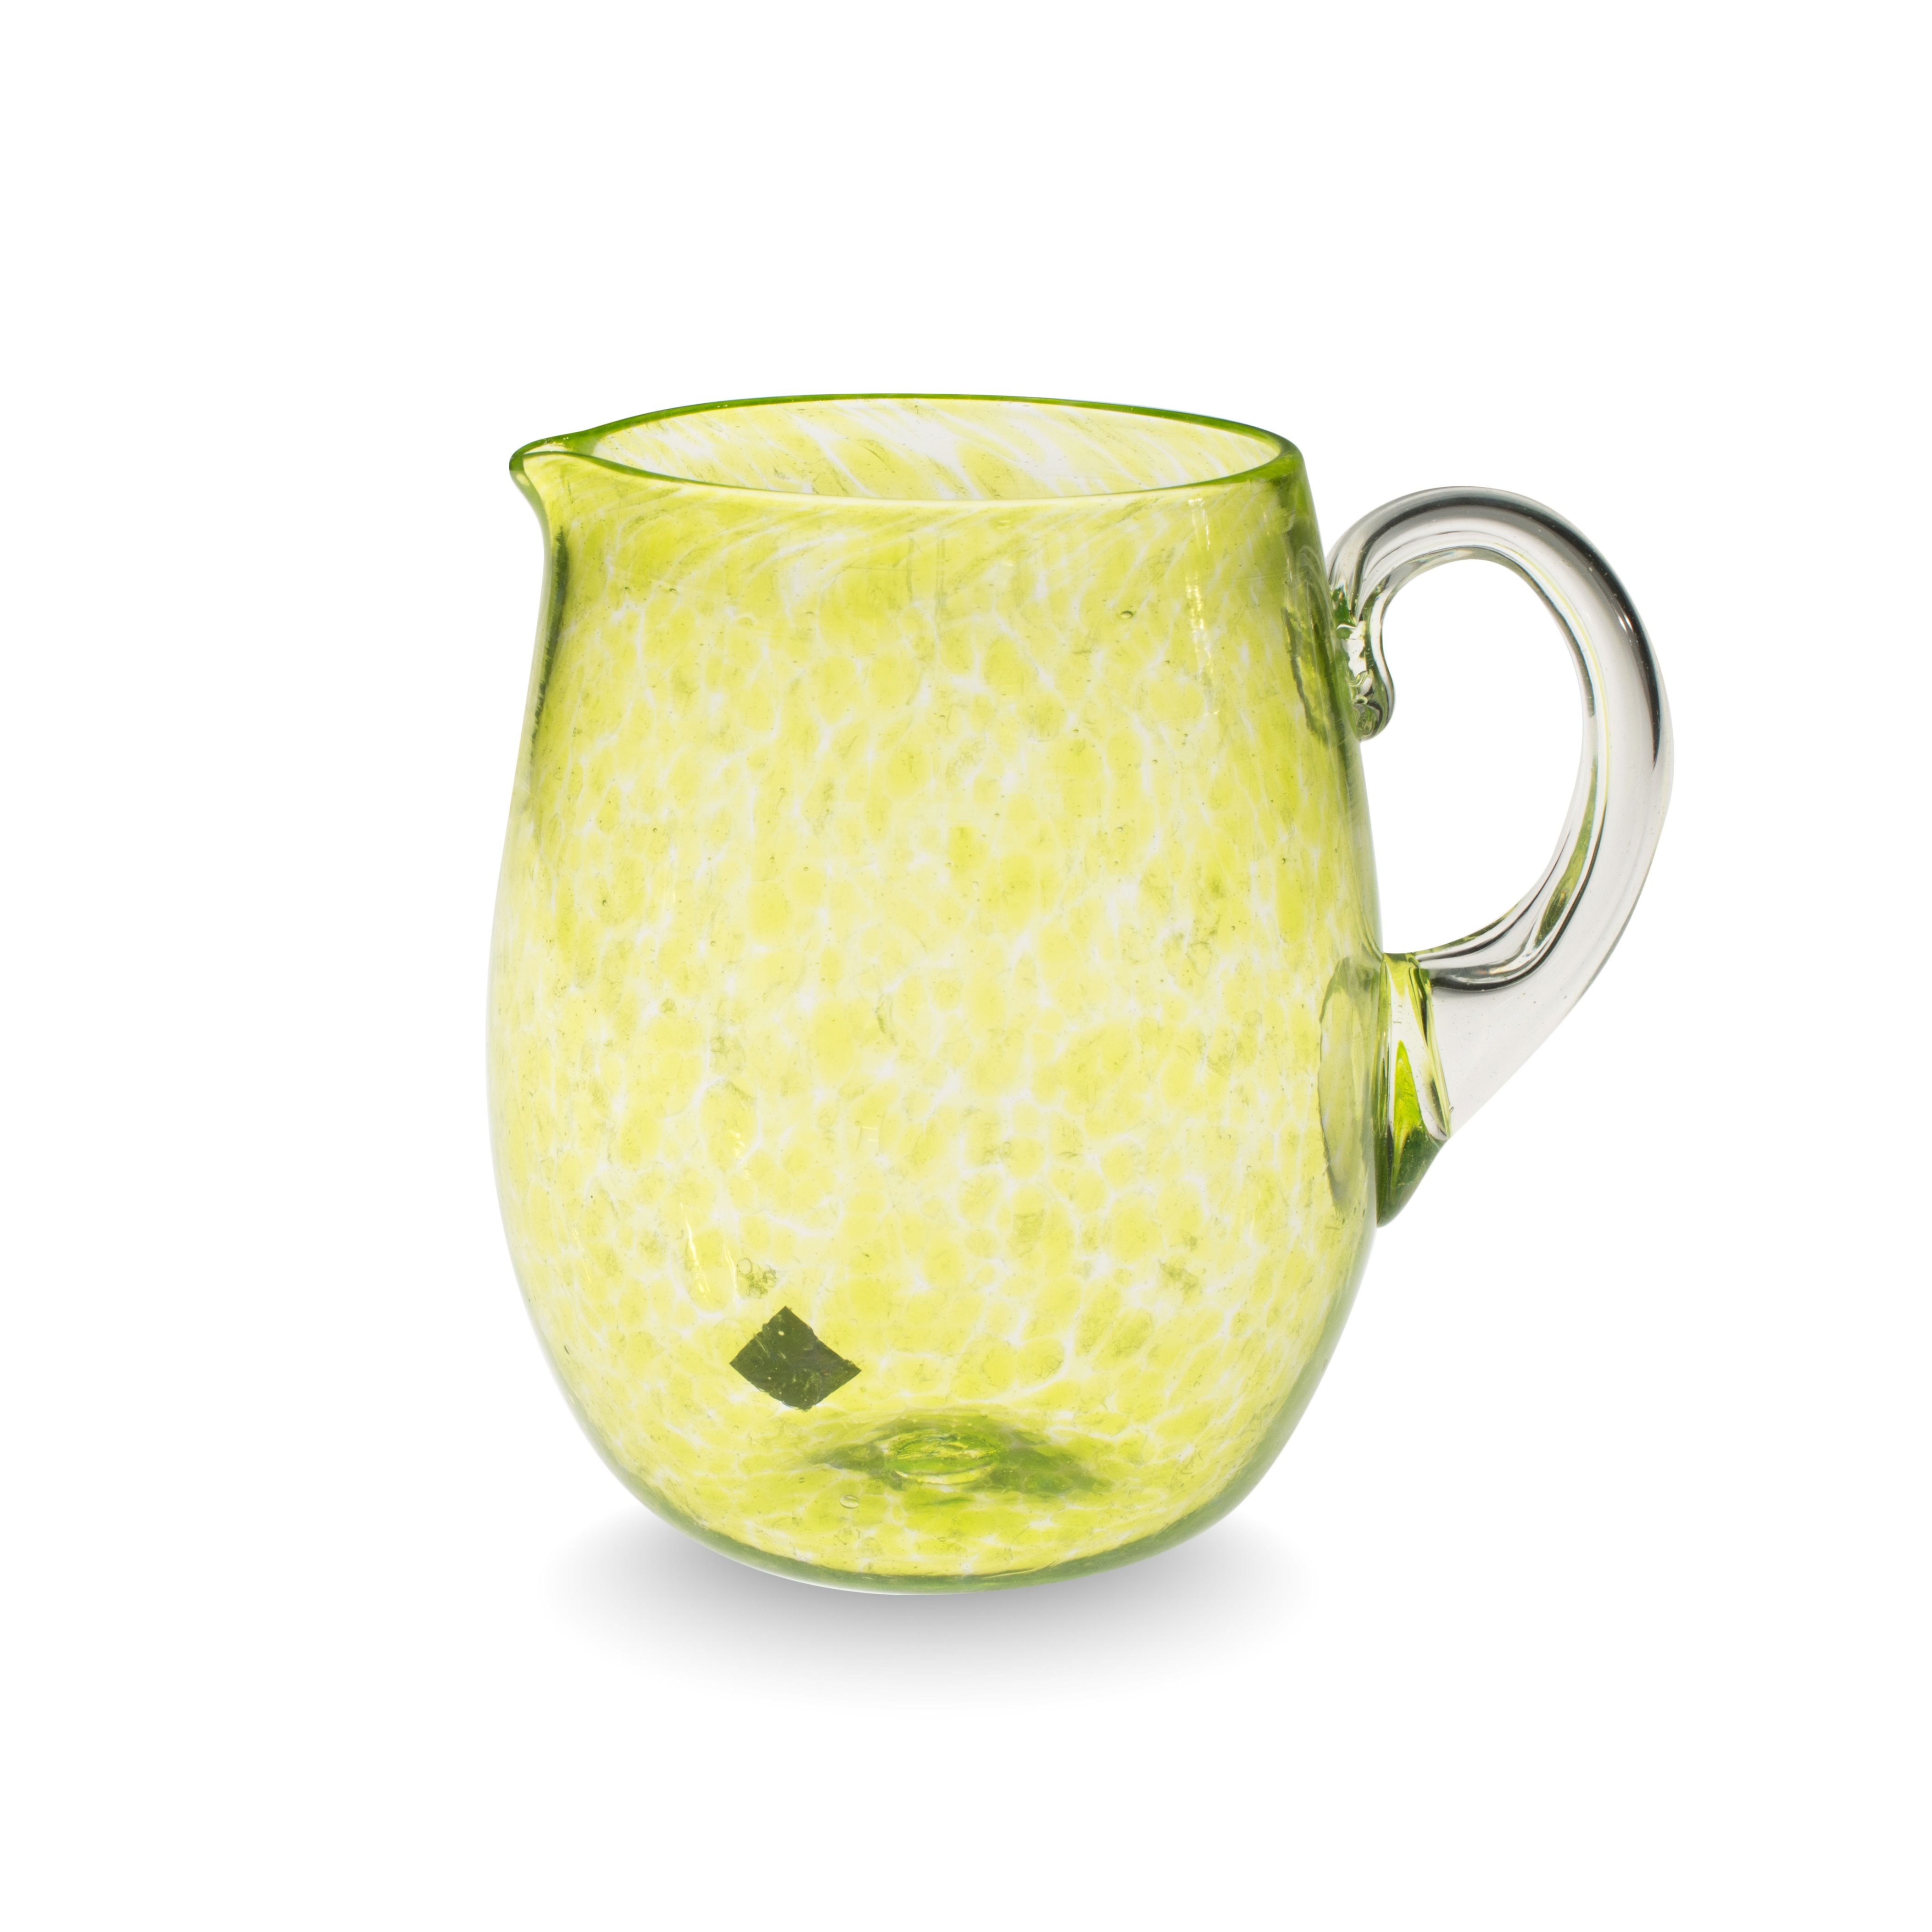 """Glow"" Jug - Murano Glass, € 190,00 by #AbateZanetti   http://www.abatezanettimurano.com/en/murano-glass-glassware/jugs/glow-acid-green-jug.html#.VRKXsjuG_7U #glass #verre #tableset #homedecor #handmade #italiandesign"